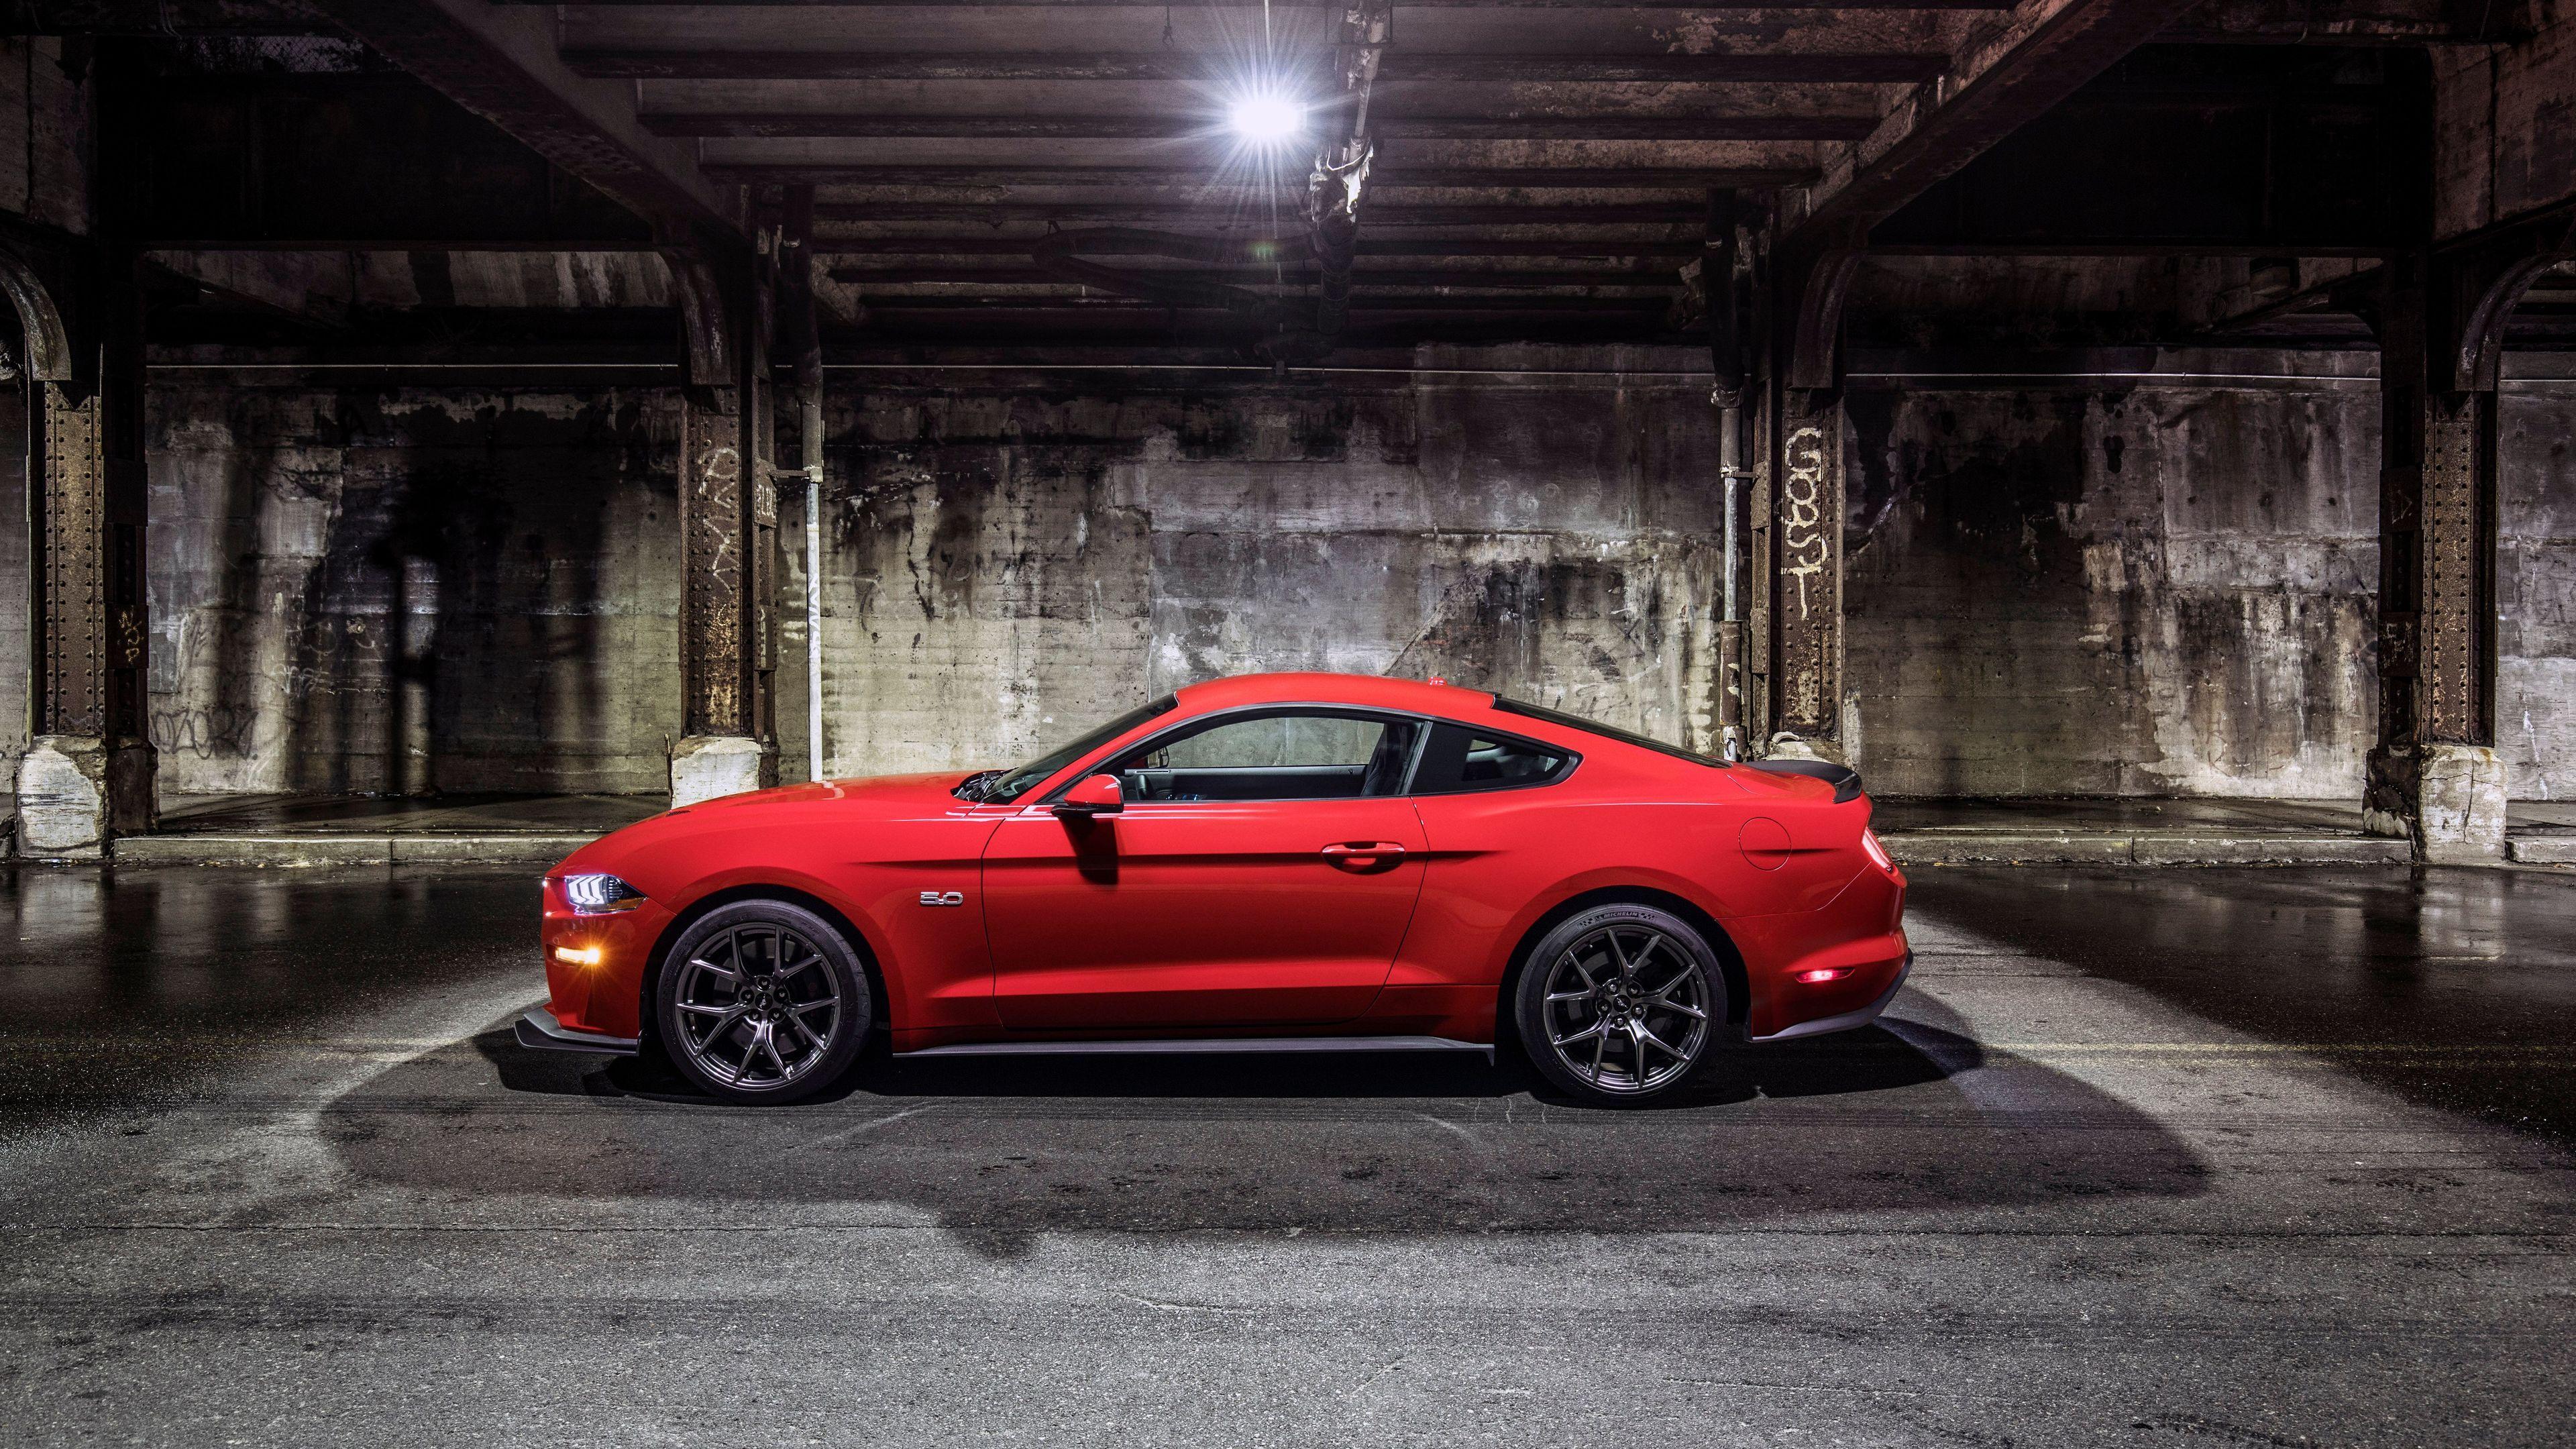 Wallpaper 4k 2018 Ford Mustang 5k 2018 Cars Wallpapers 4k